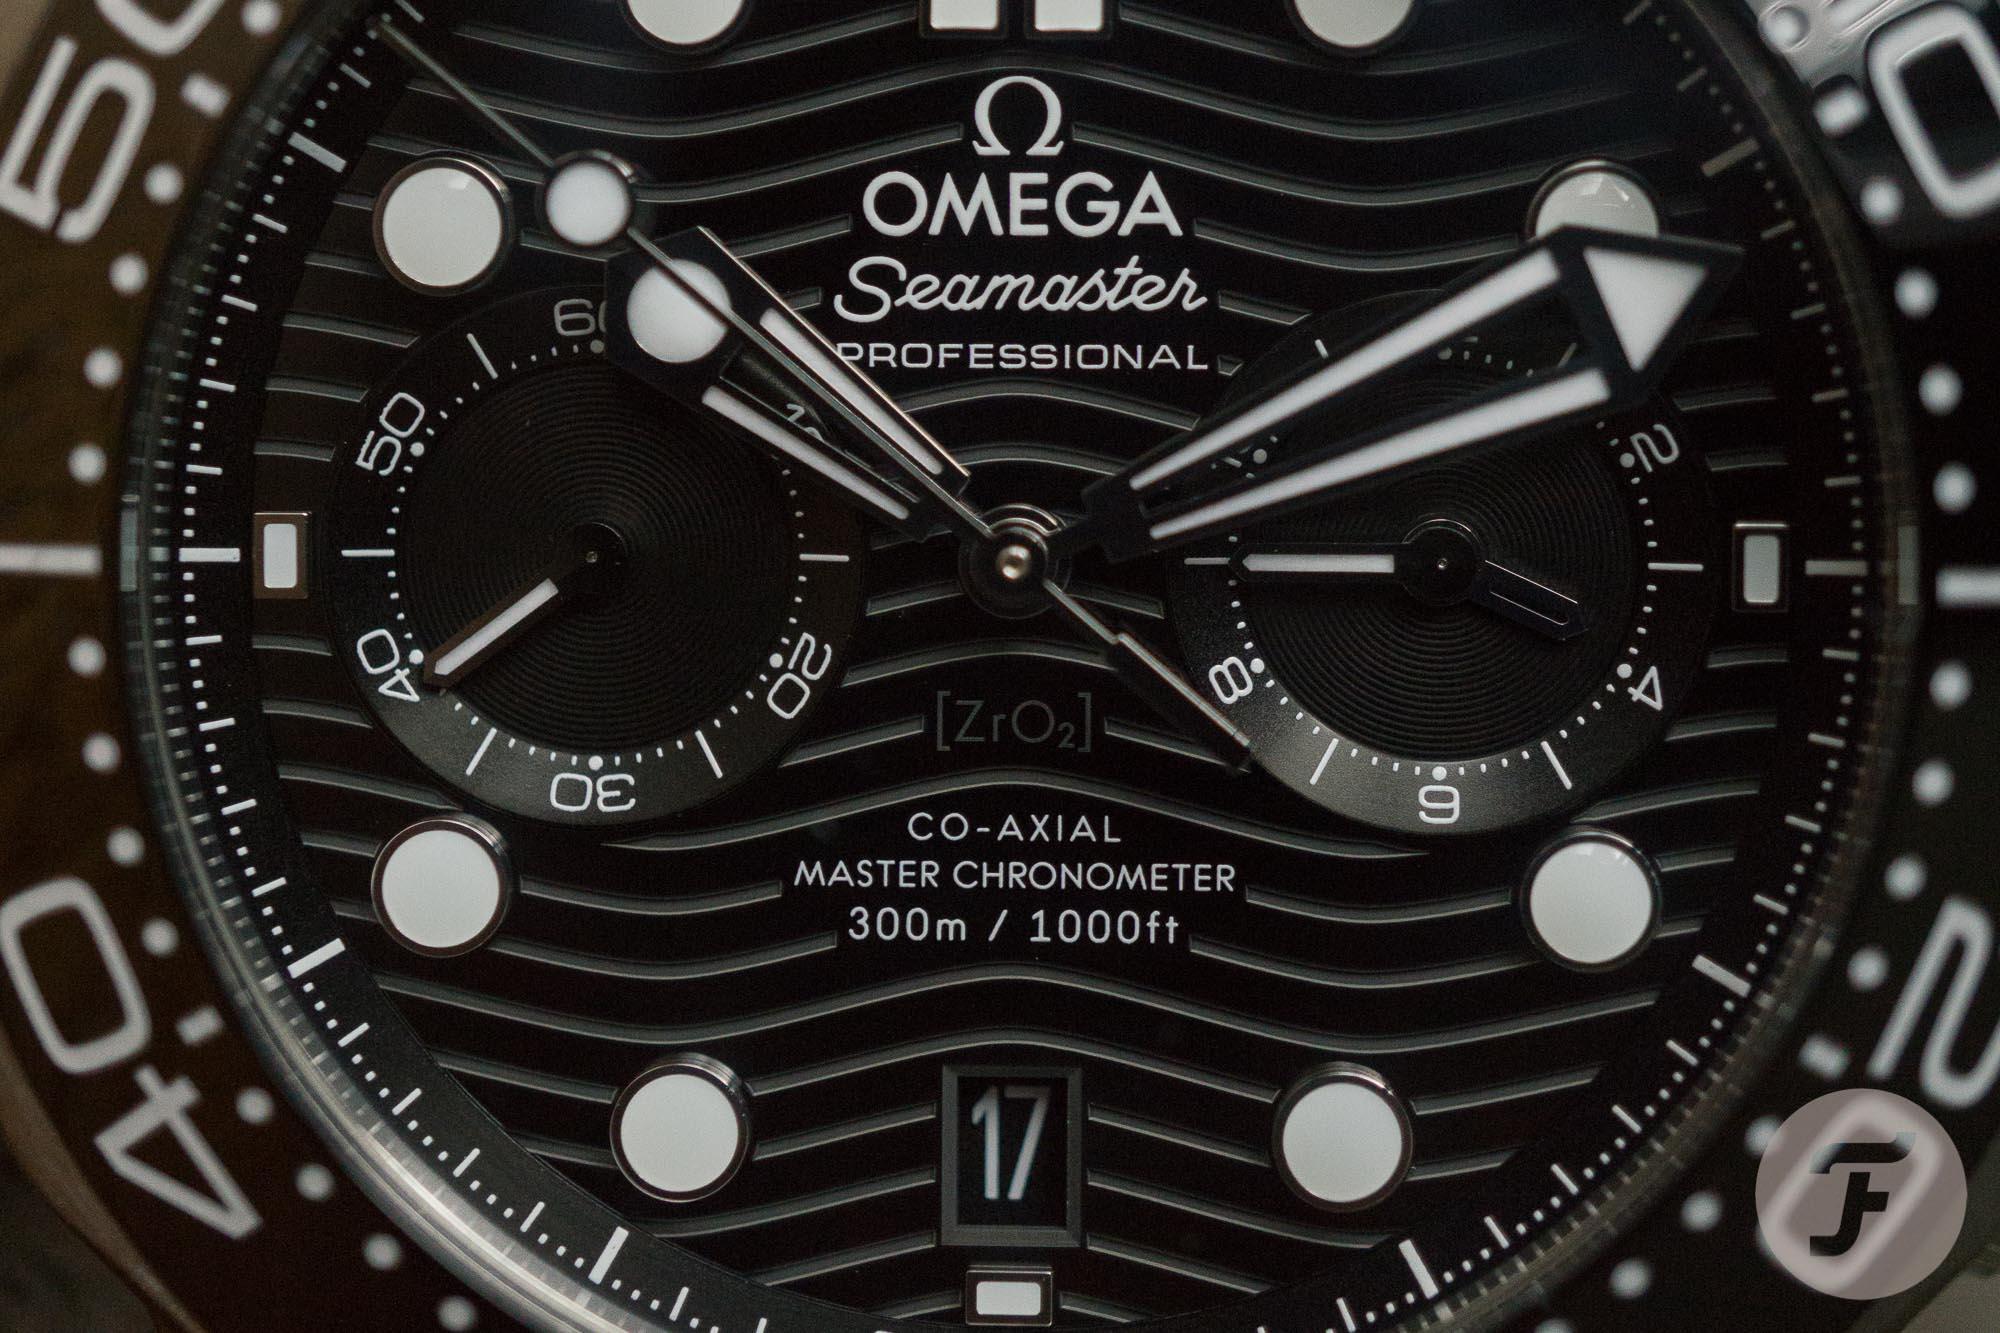 Omega Seamaster DIVER 300M CO%E2%80%91AXIAL MASTER CHRONOMETER CHRONOGRAPH 44 MM 4 of 20 - Khám phá Omega Seamaster 300M Chronograph